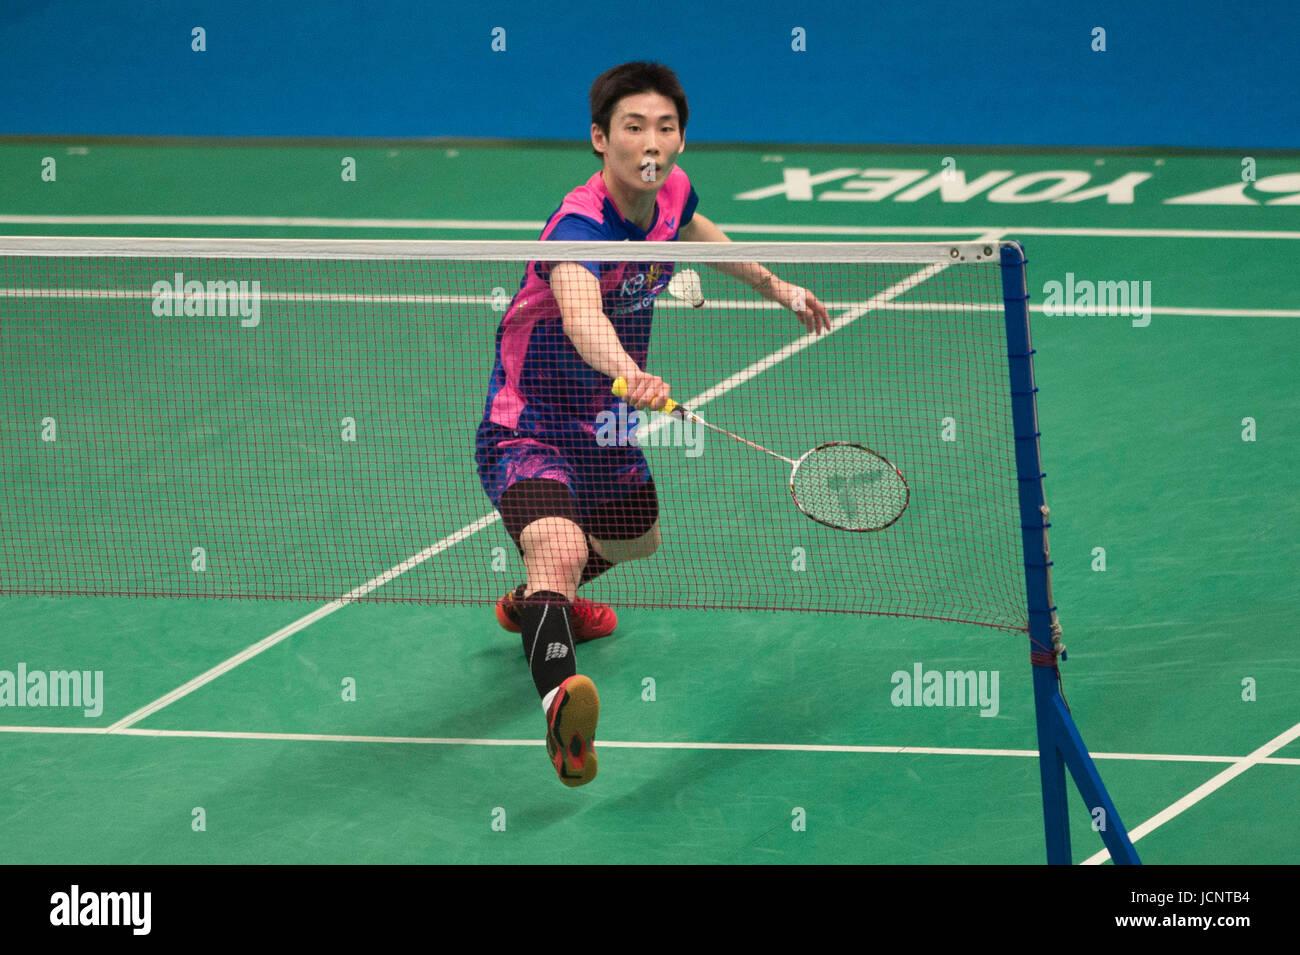 Jakarta Indonesia 16th June 2017 Son Wan Ho of South Korea